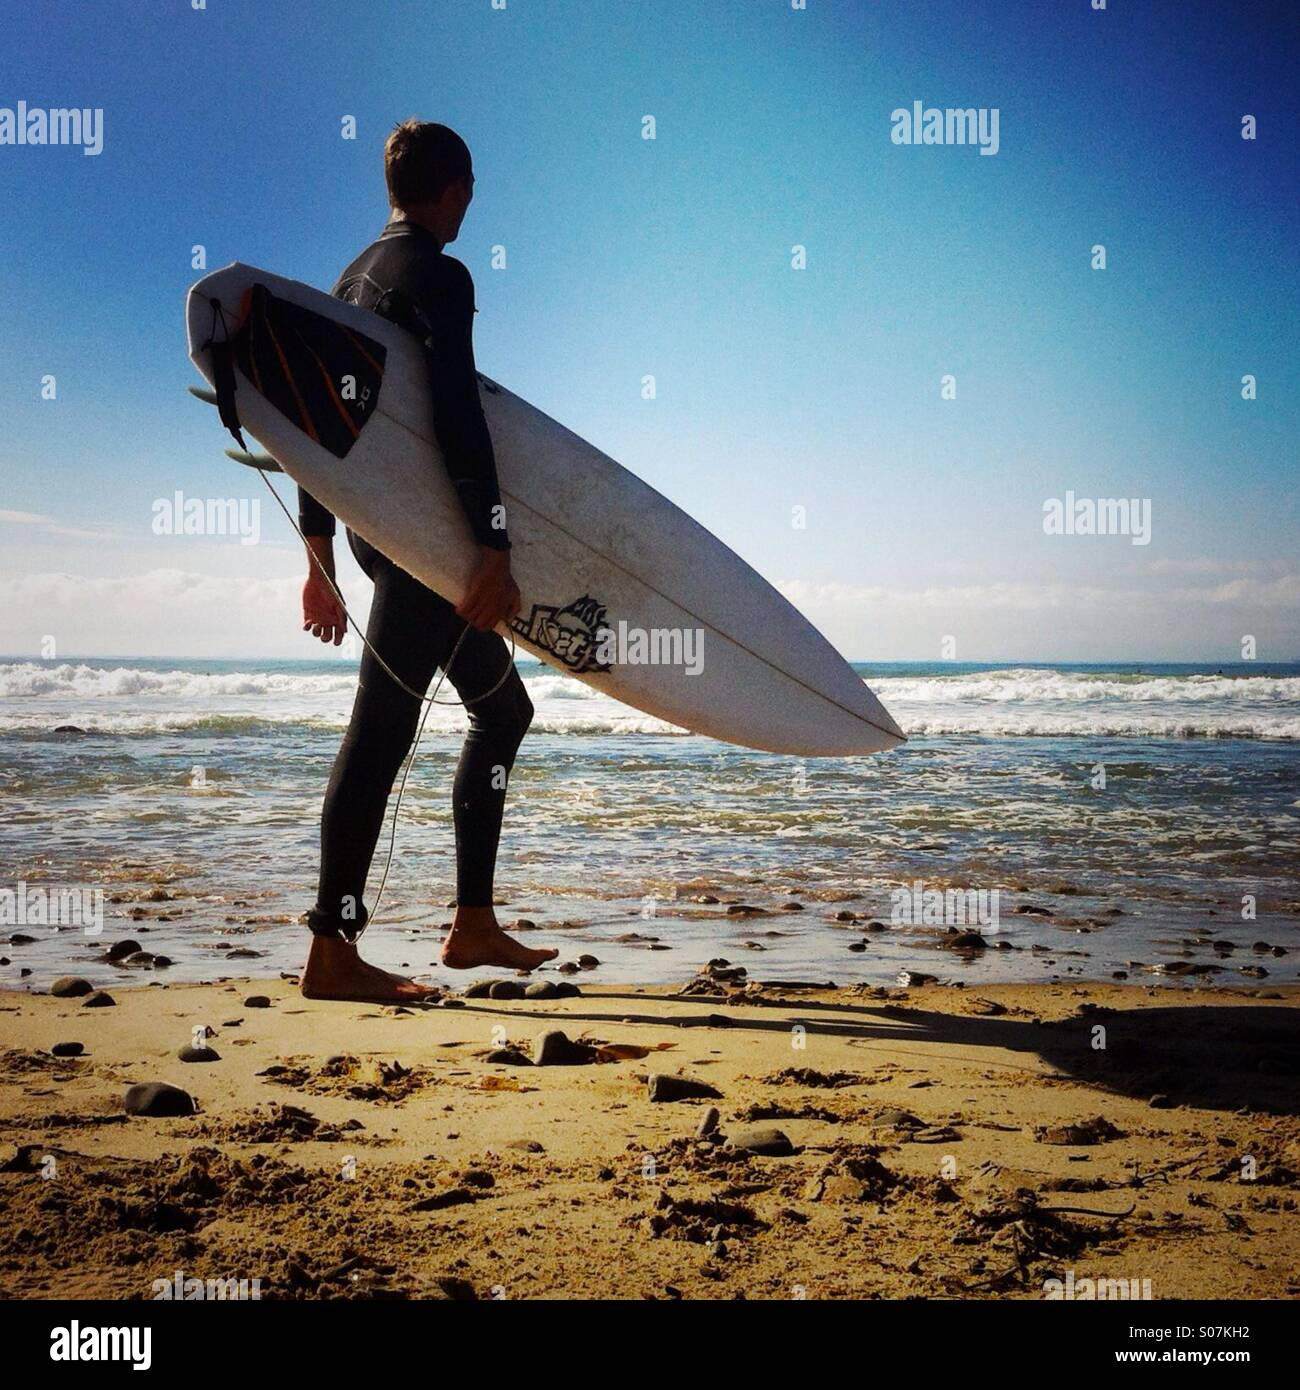 Un internaute s'approche de la plage. Ventura California USA. Banque D'Images